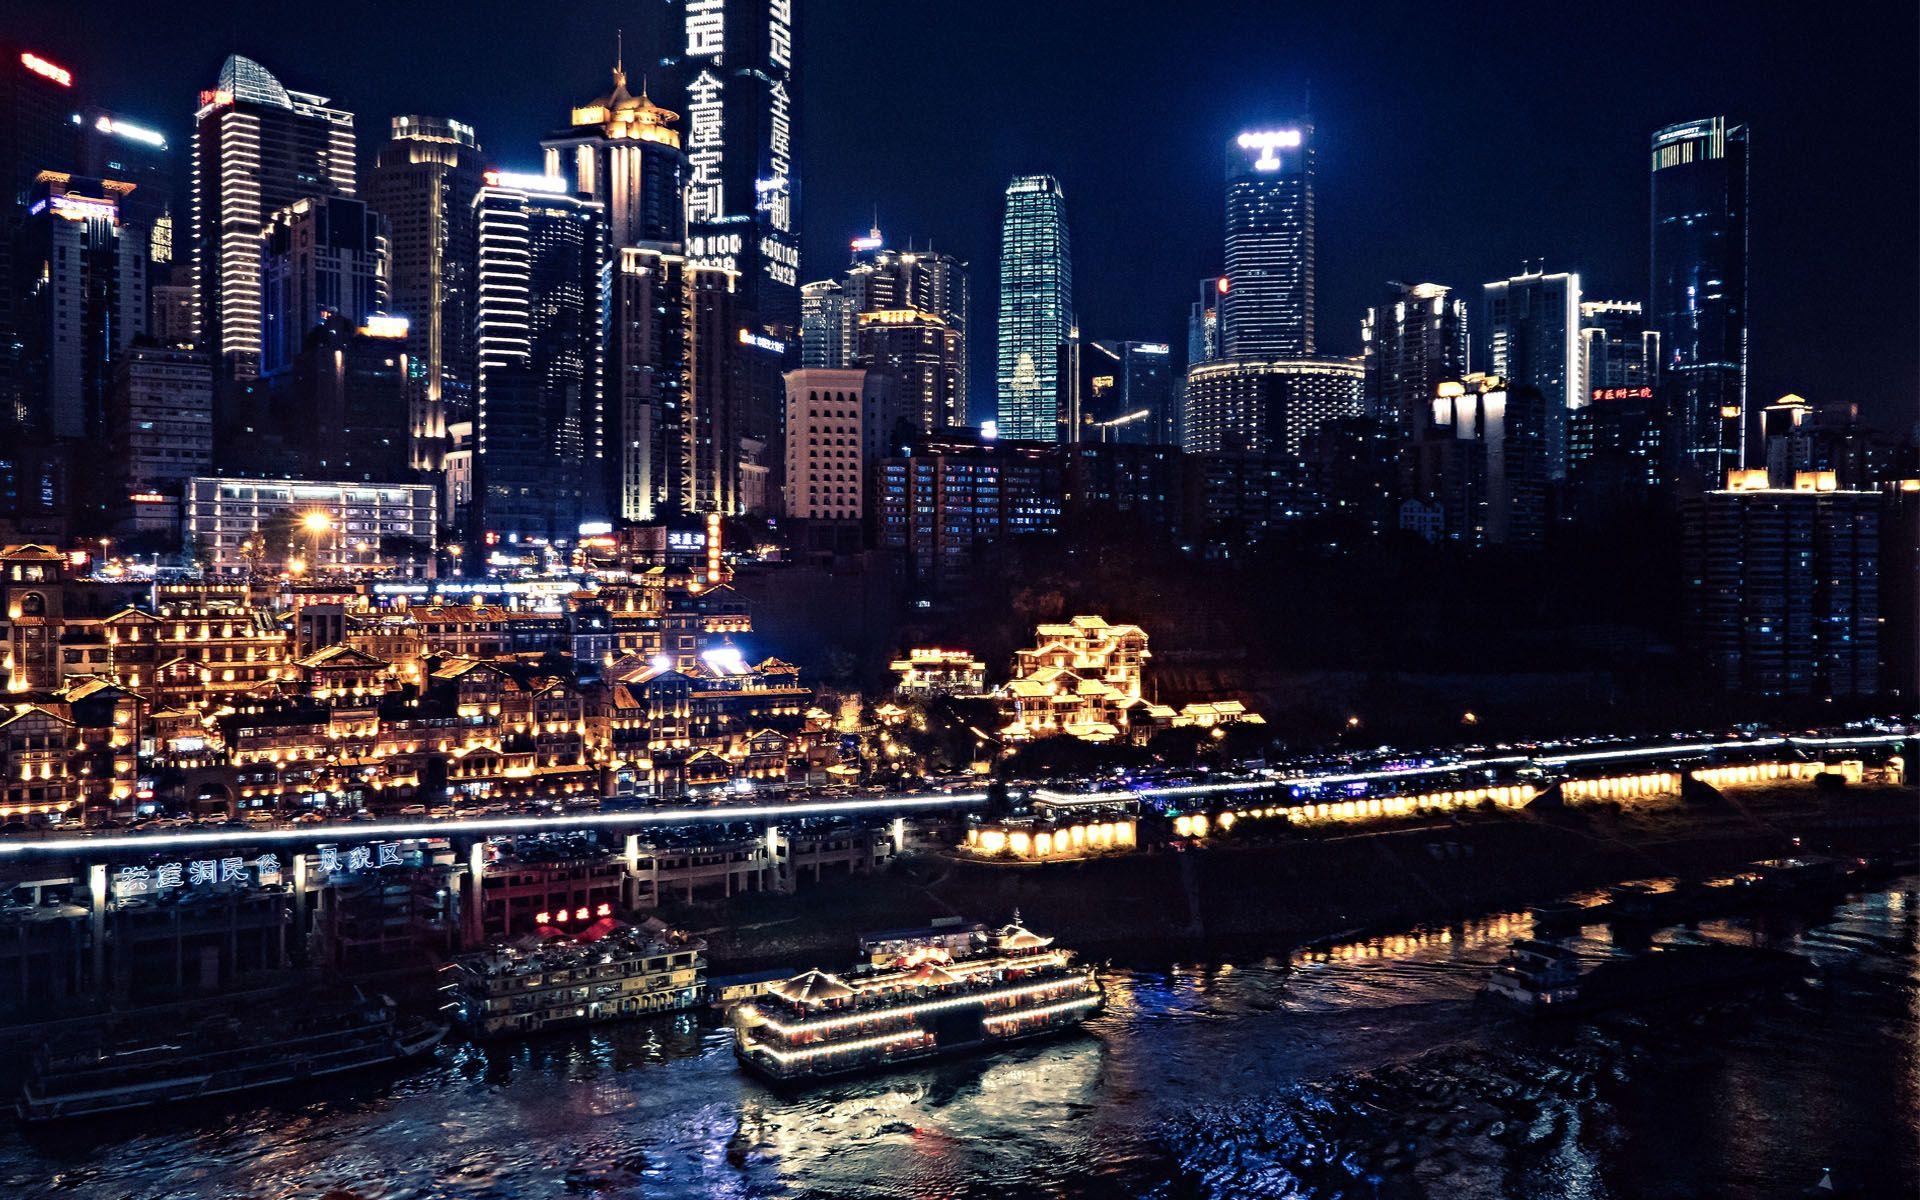 Chongqing China Hd Wallpaper City Wallpaper Chongqing Chongqing China